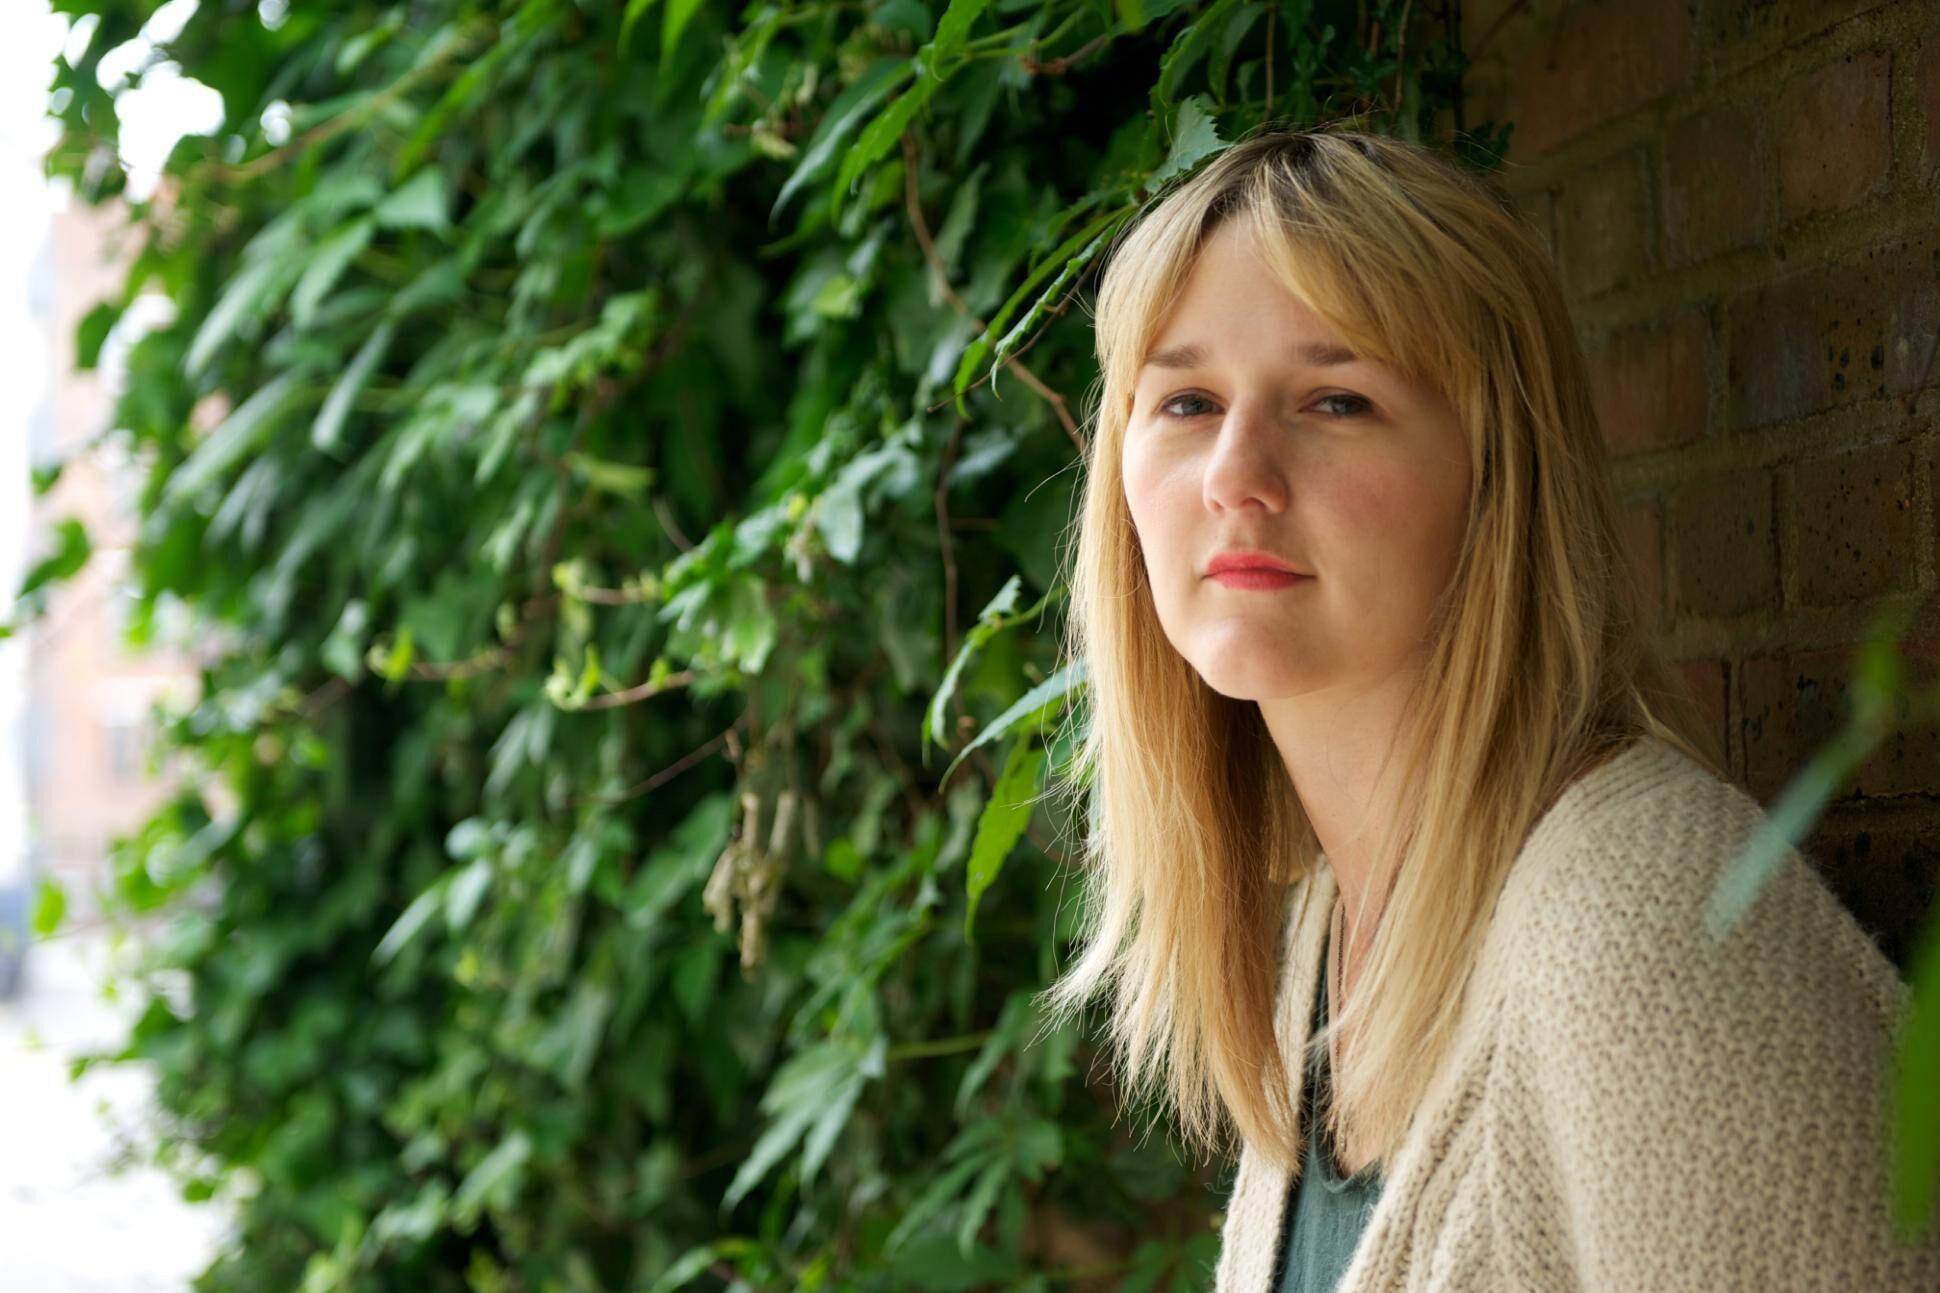 Image of Clare Pollard